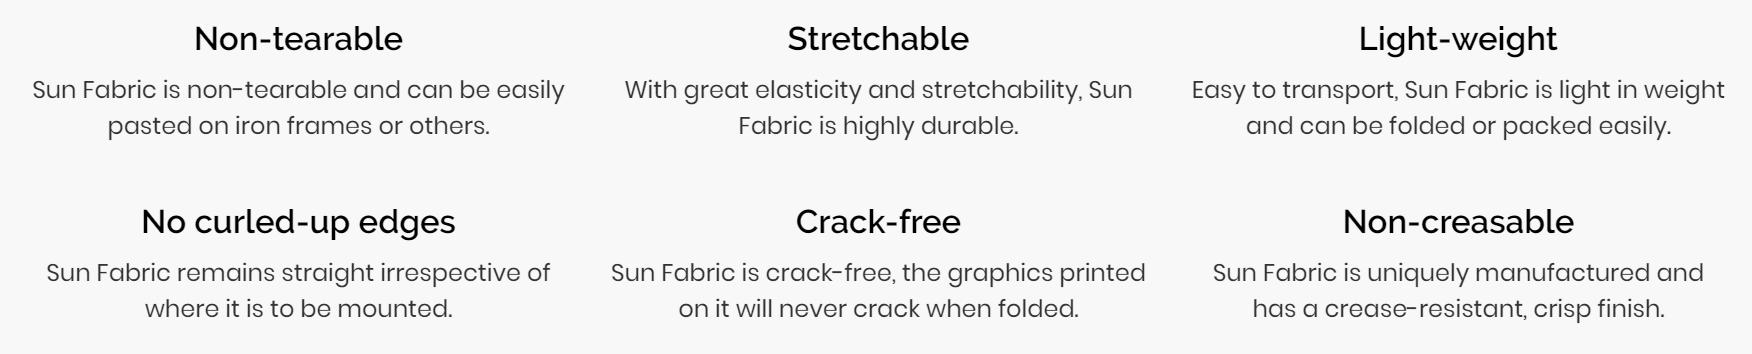 Sun Fabric Printable Fabrics